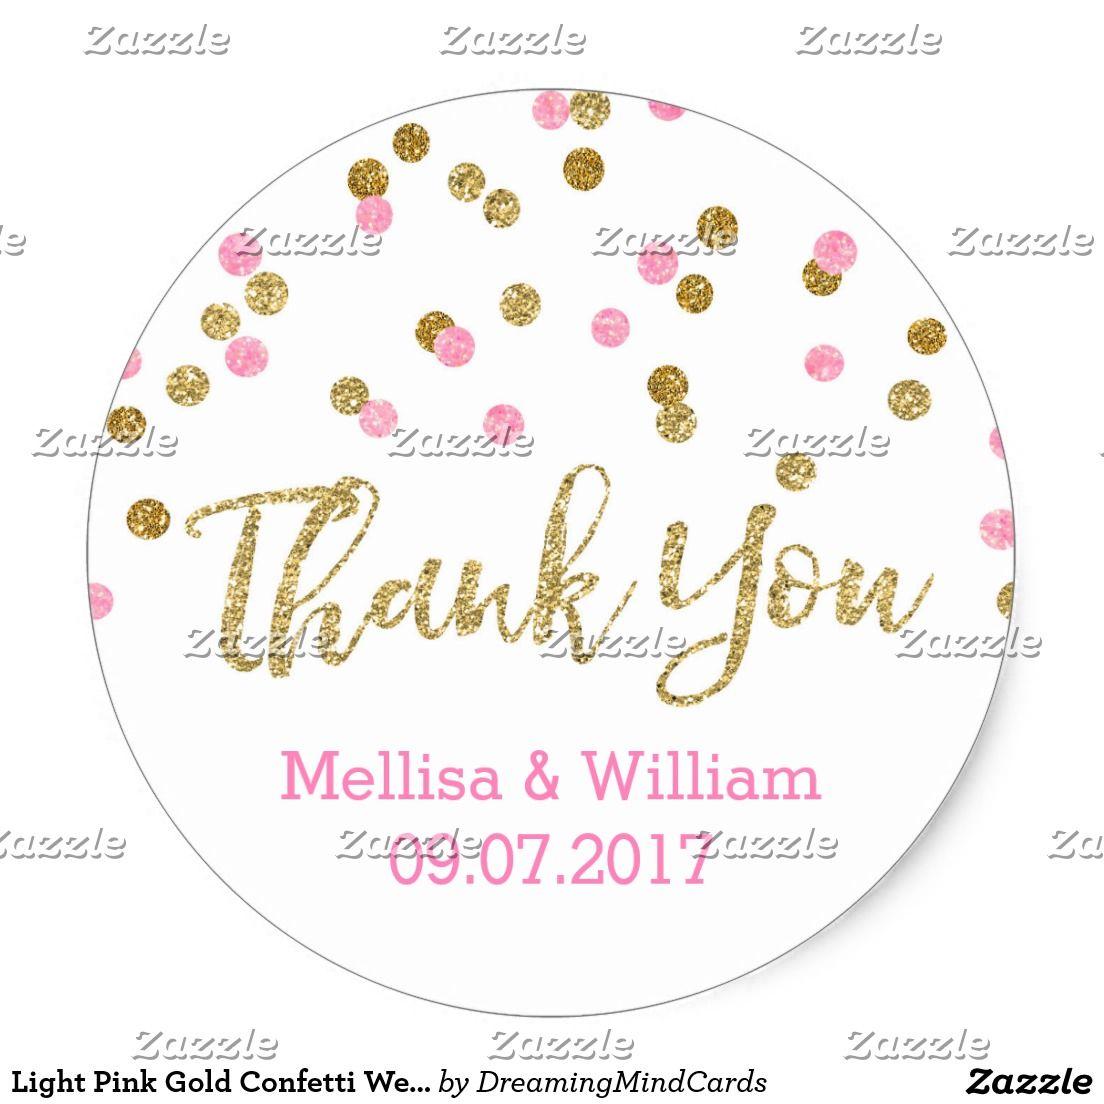 Light Pink Gold Confetti Wedding Favor Tags   Wedding favor tags ...